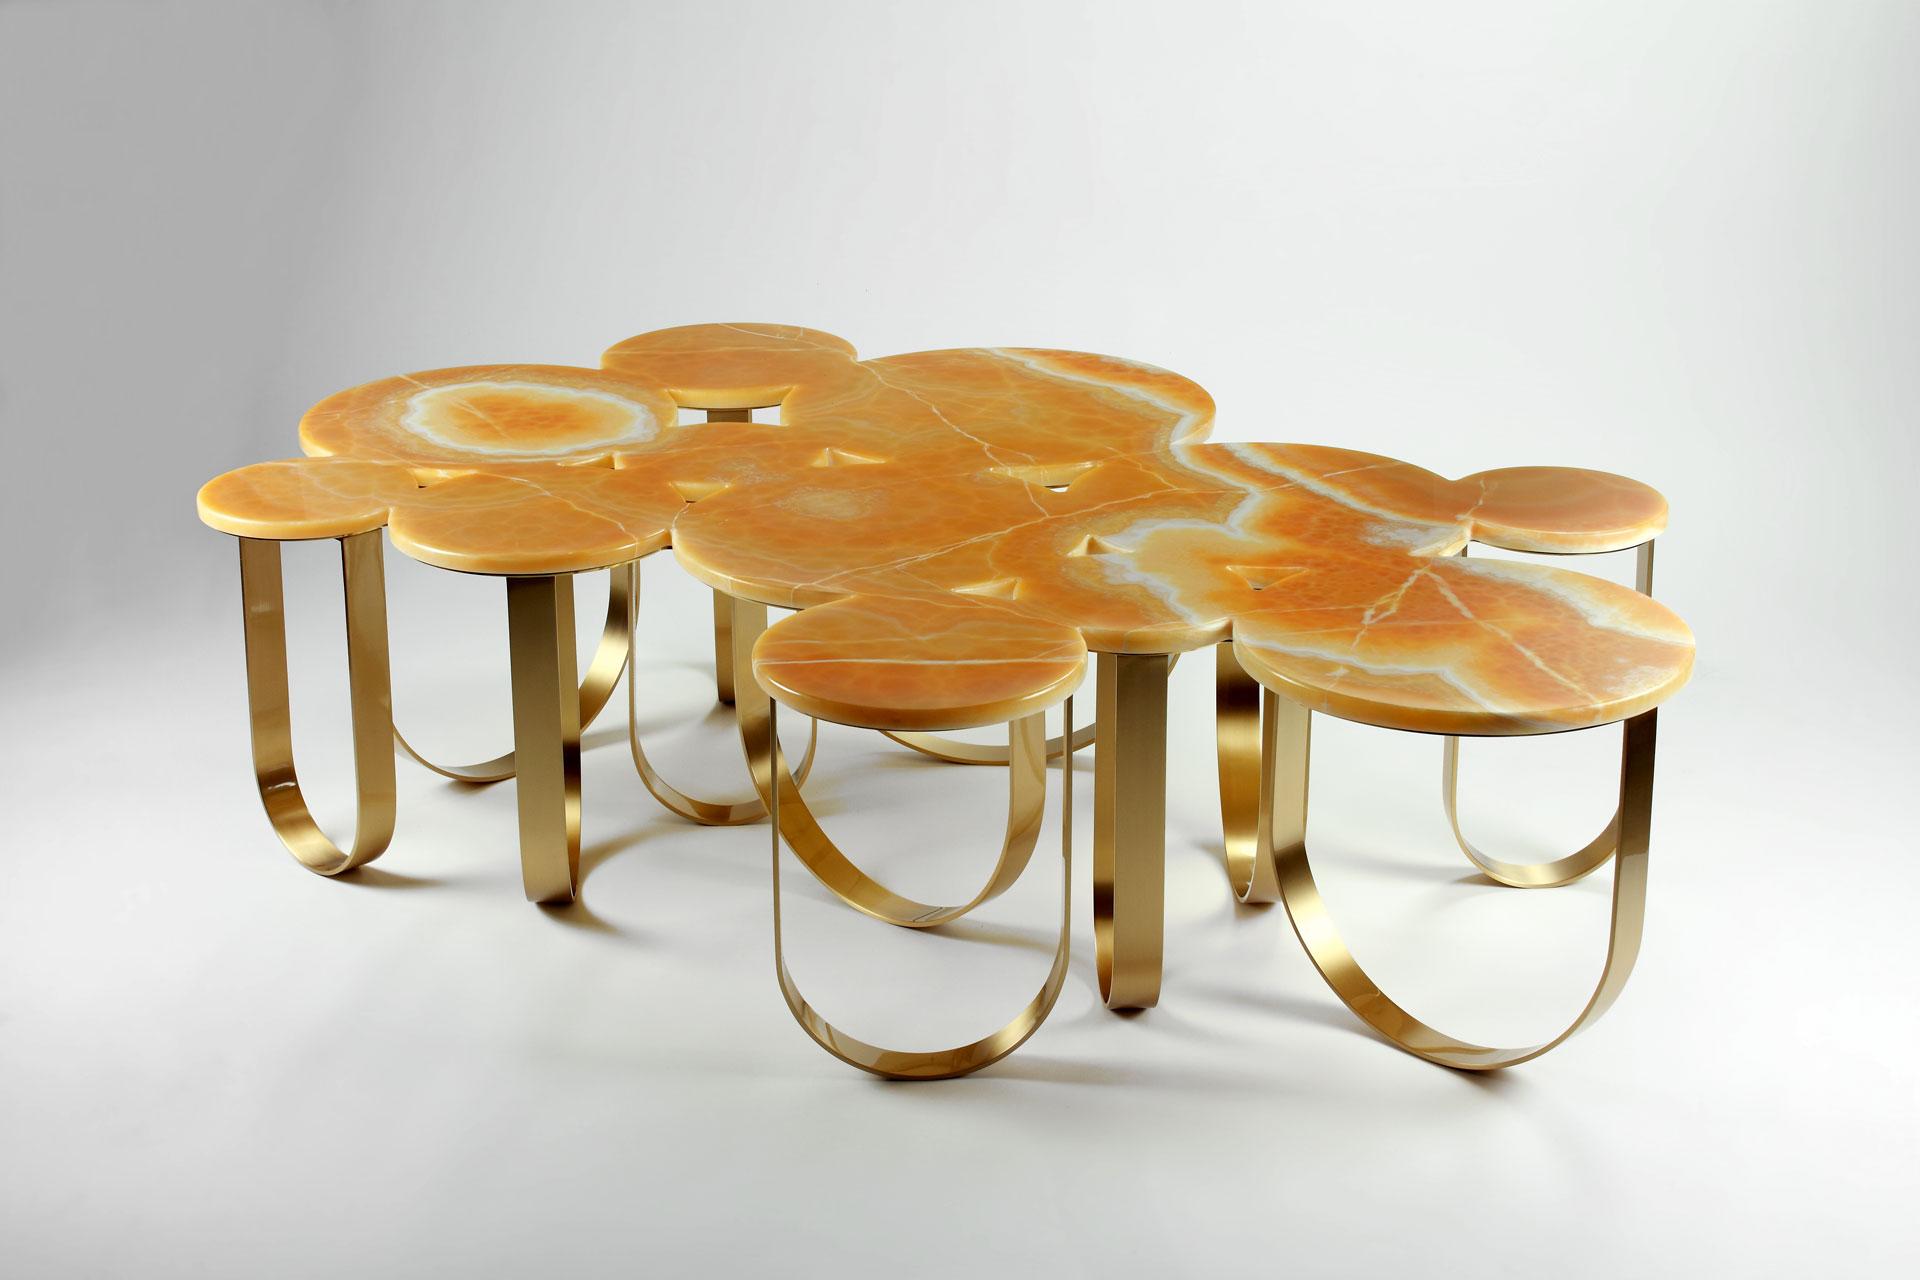 Cloud coffee table - Barberini & Gunnell